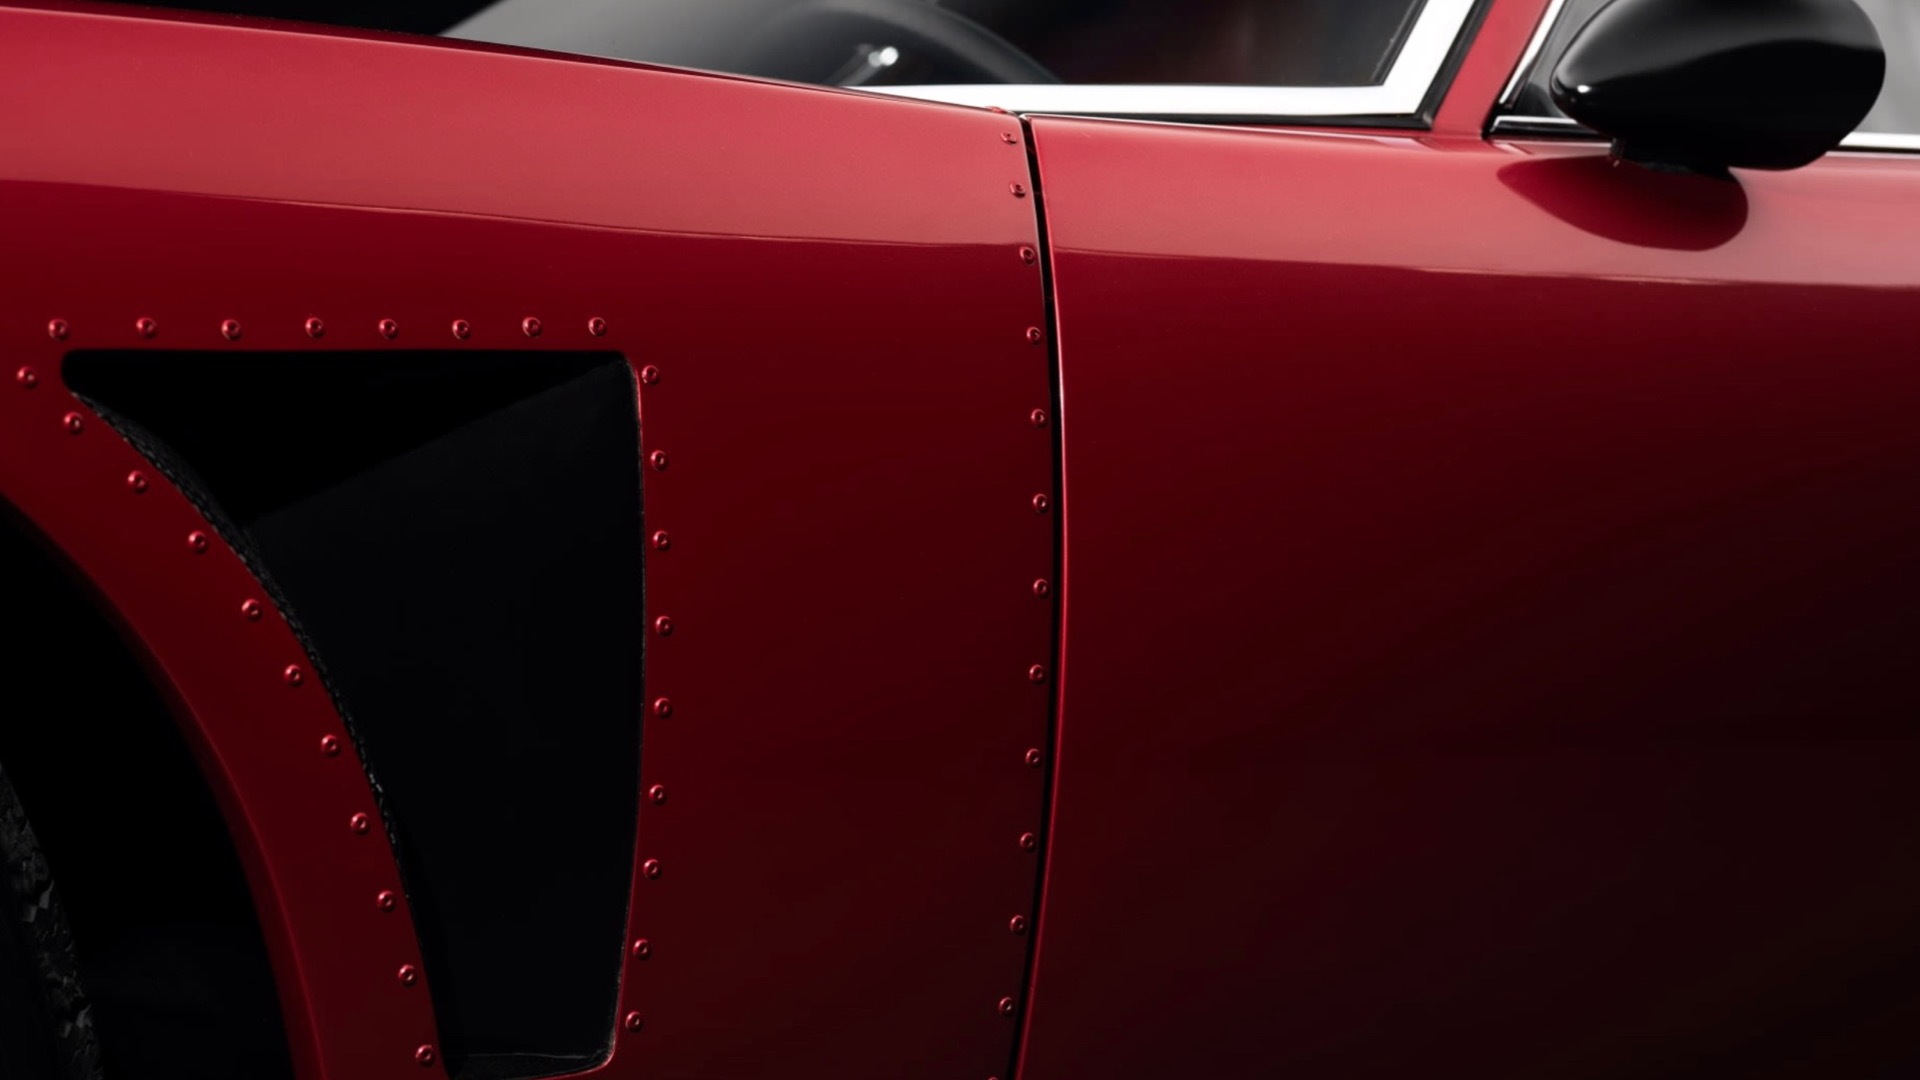 1972 Lamborghini Miura SVJ (photo via Kidston)